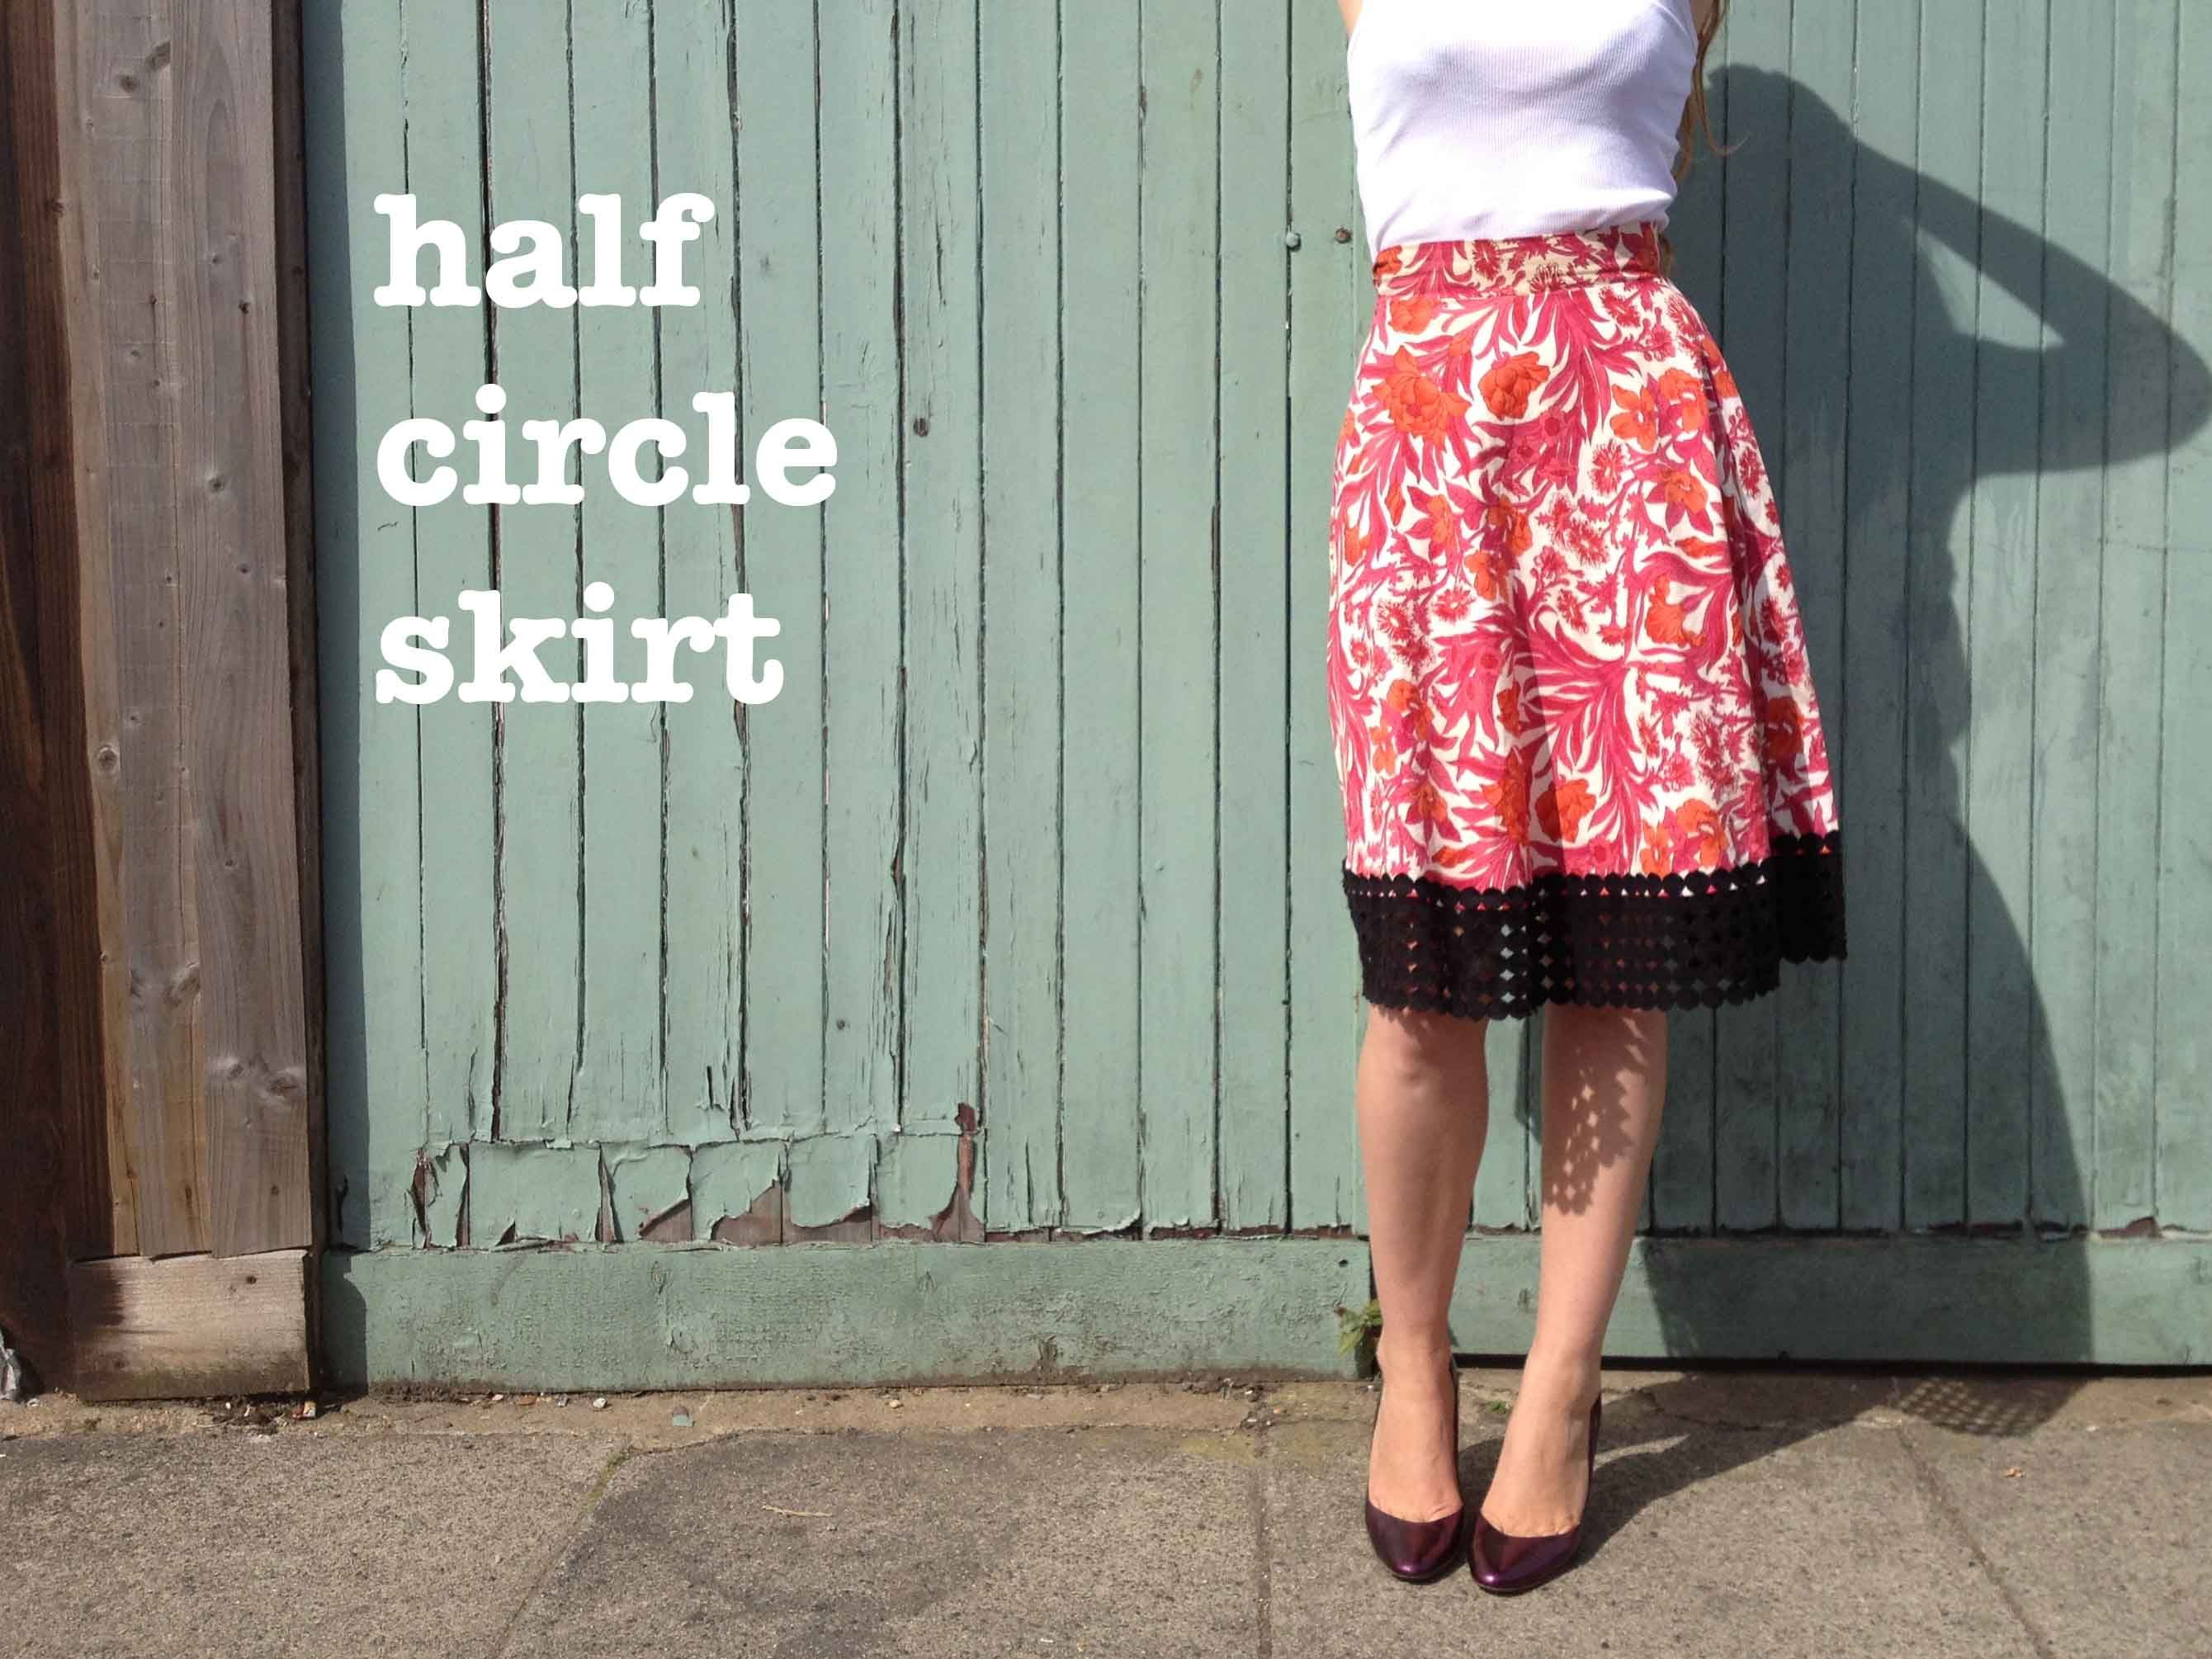 Circle skirt maths - explained! | Pinterest | Circle skirts, Circle ...